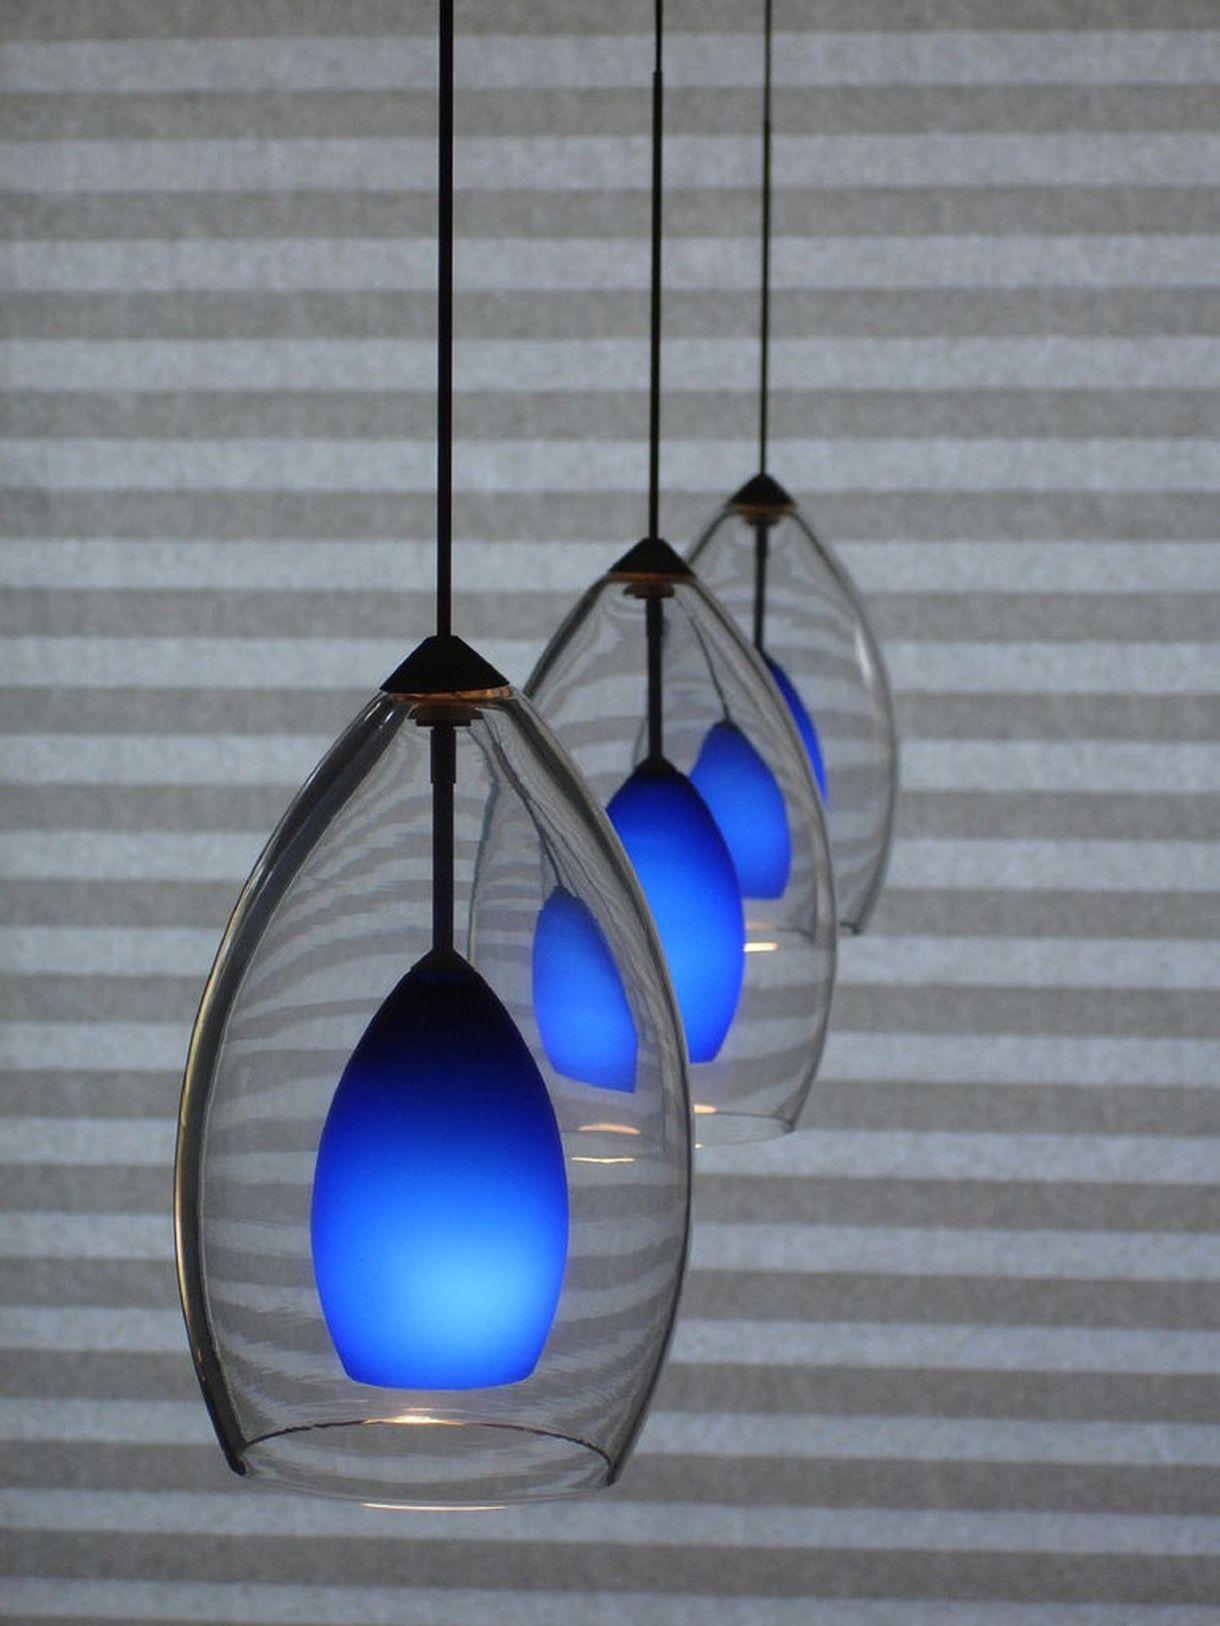 Elegant Blue Pendant Lamp Design Idea By David Hunter Making .